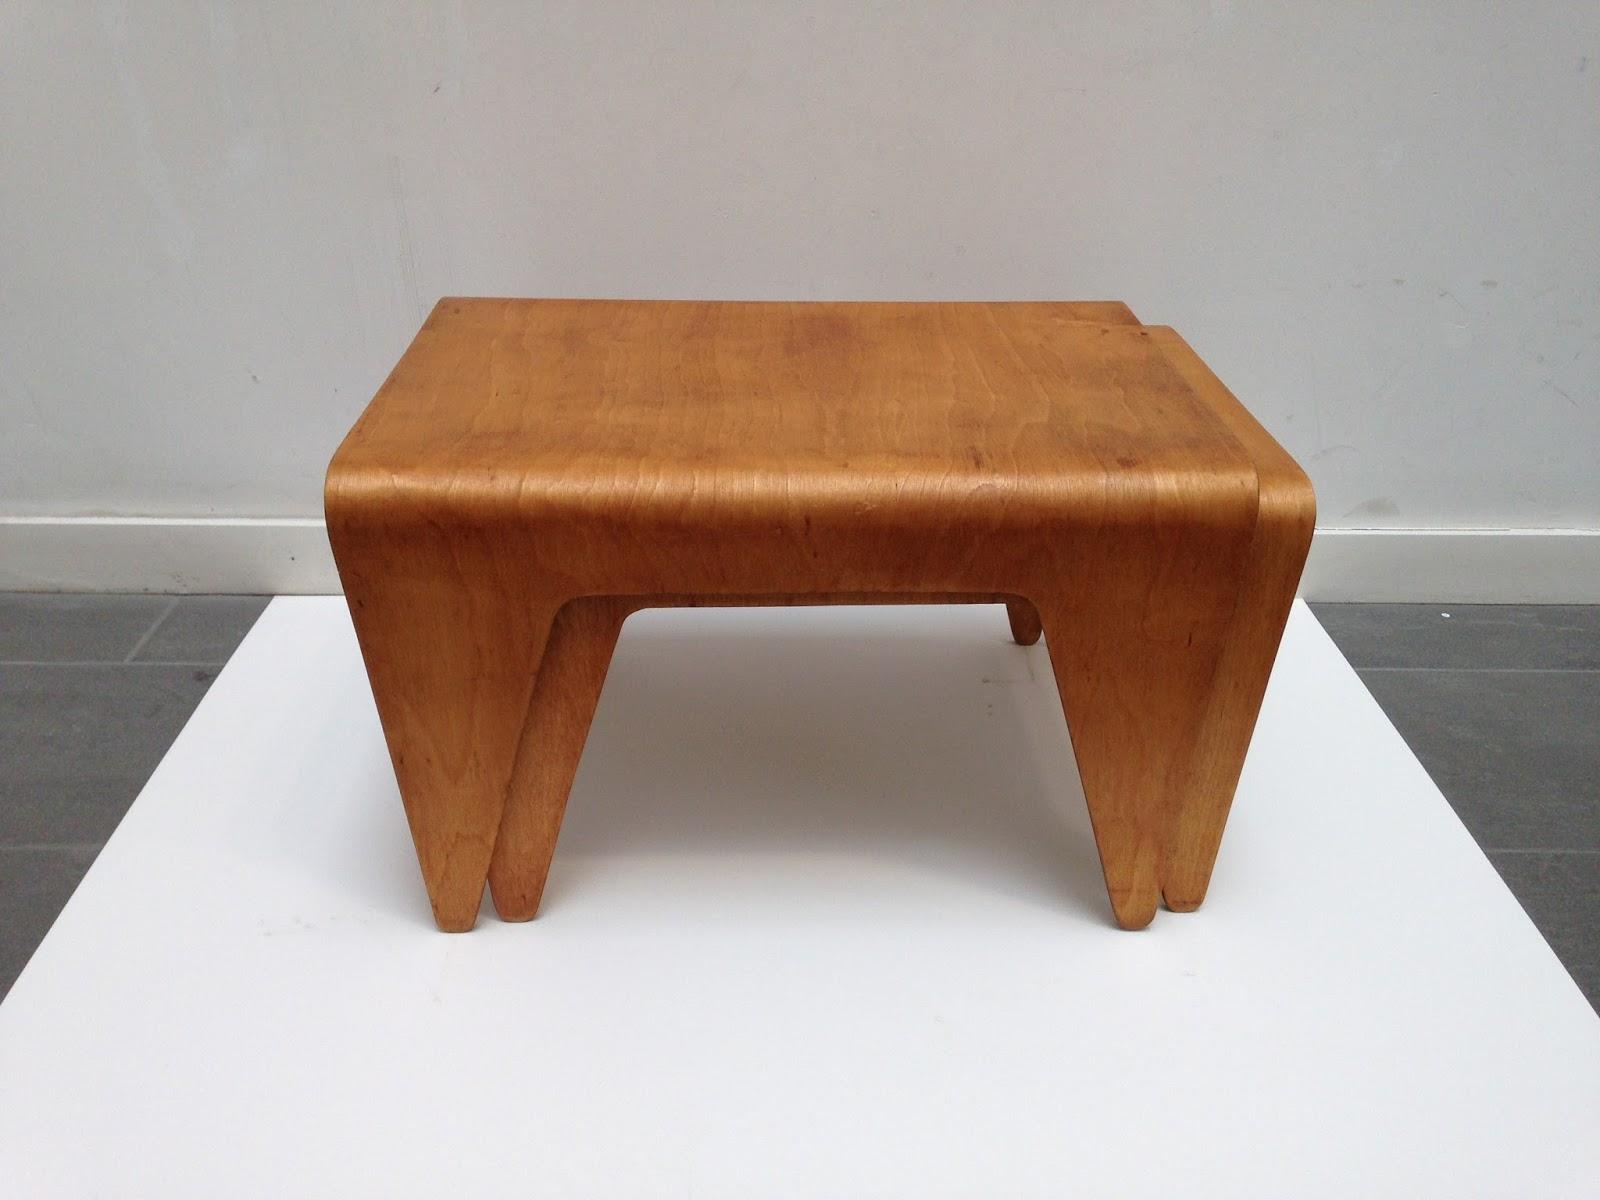 Scott Campbell: Marcel Breuer Nest Of Tables 1936